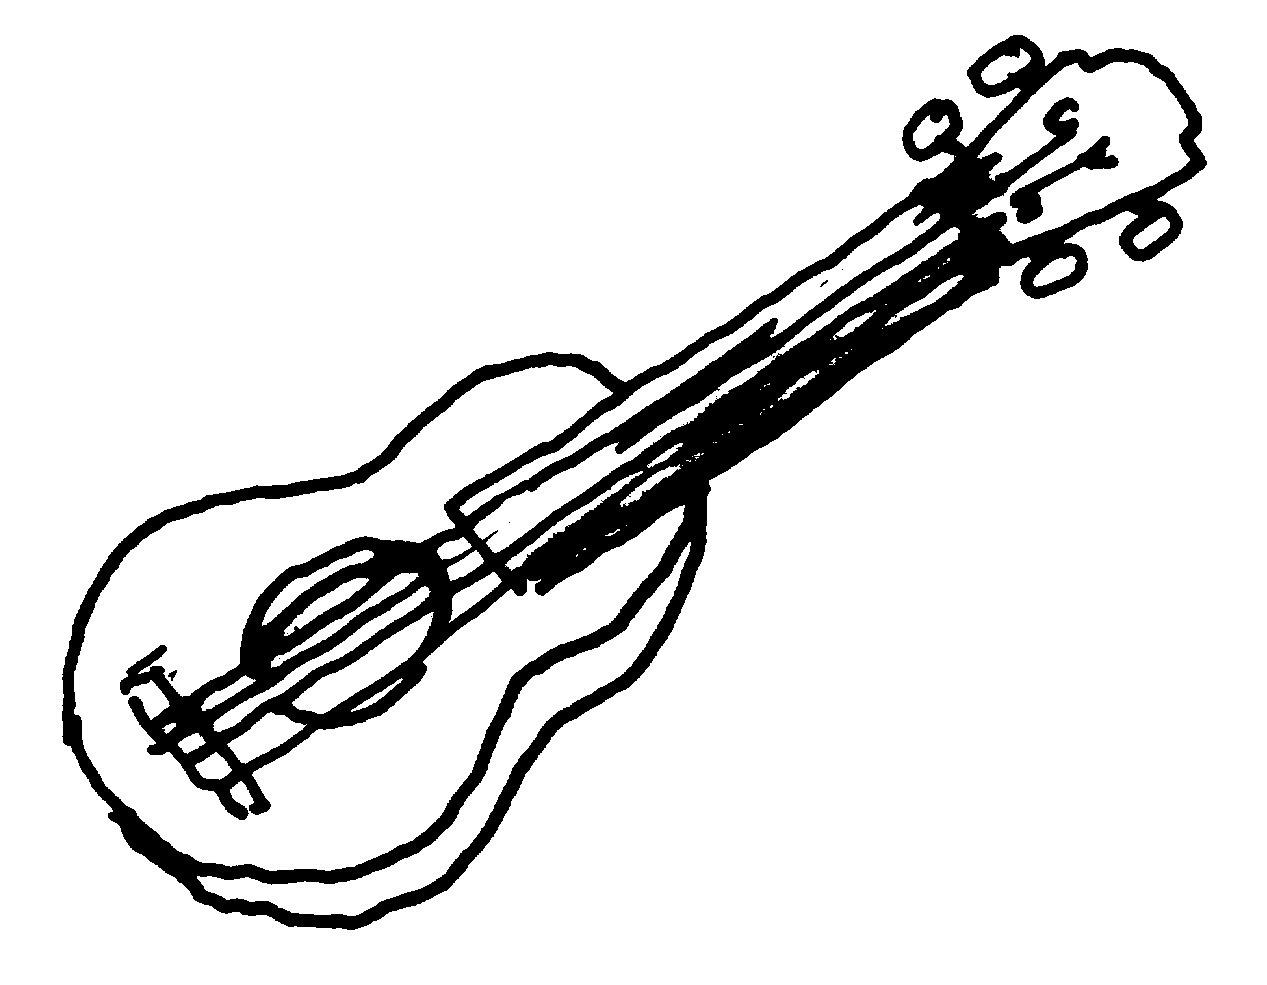 Clipart black and white guitar clip art freeuse Guitar black and white guitar clip art images - WikiClipArt clip art freeuse